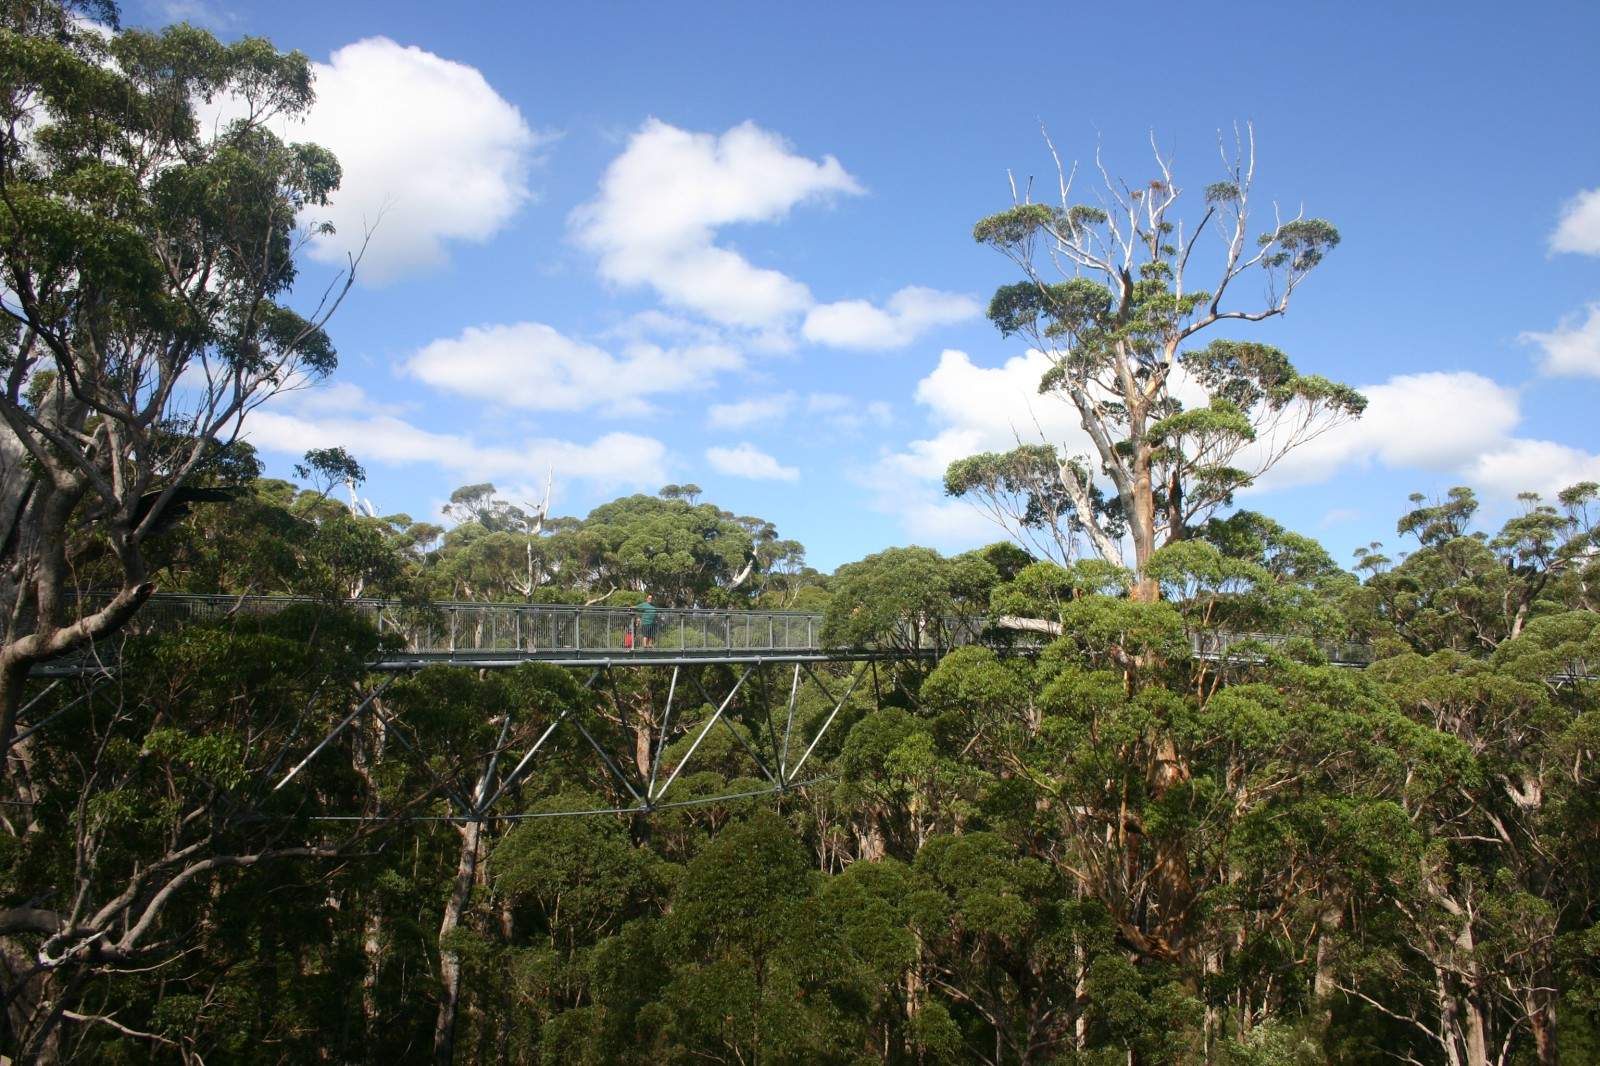 Walpole Australia  city photos gallery : ... of the Giants, Walpole, Western Australia [1600x1066] : BotanicalPorn